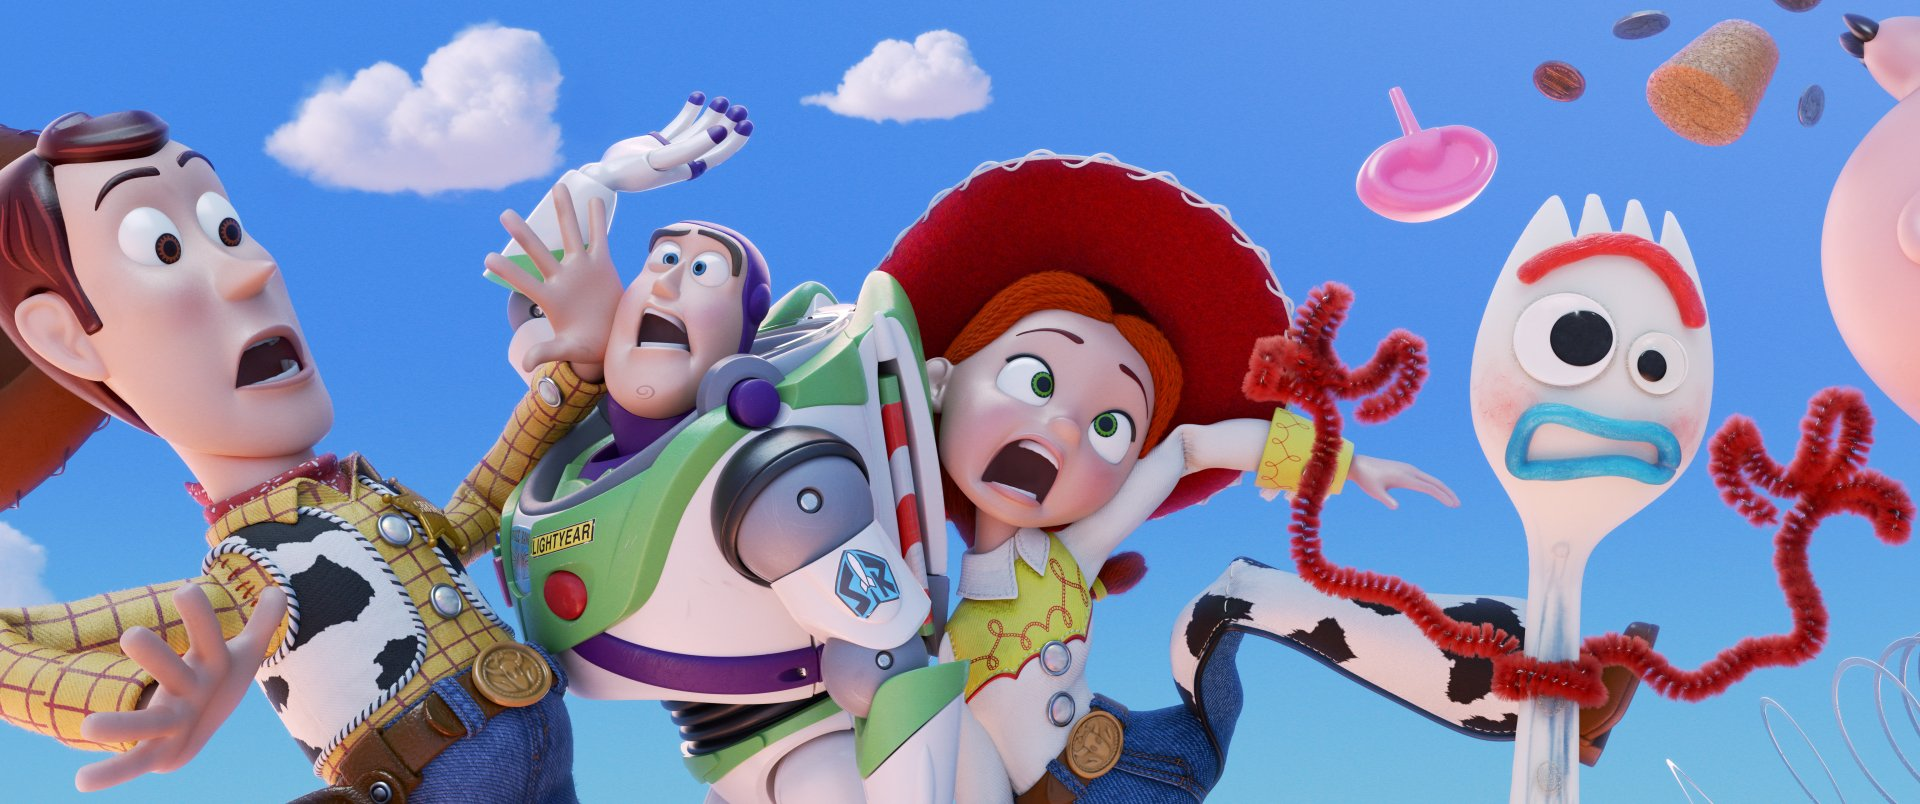 Toy Story 4 4k Ultra Fond d'écran HD | Arrière-Plan | 6144x2574 | ID:1025964 - Wallpaper Abyss